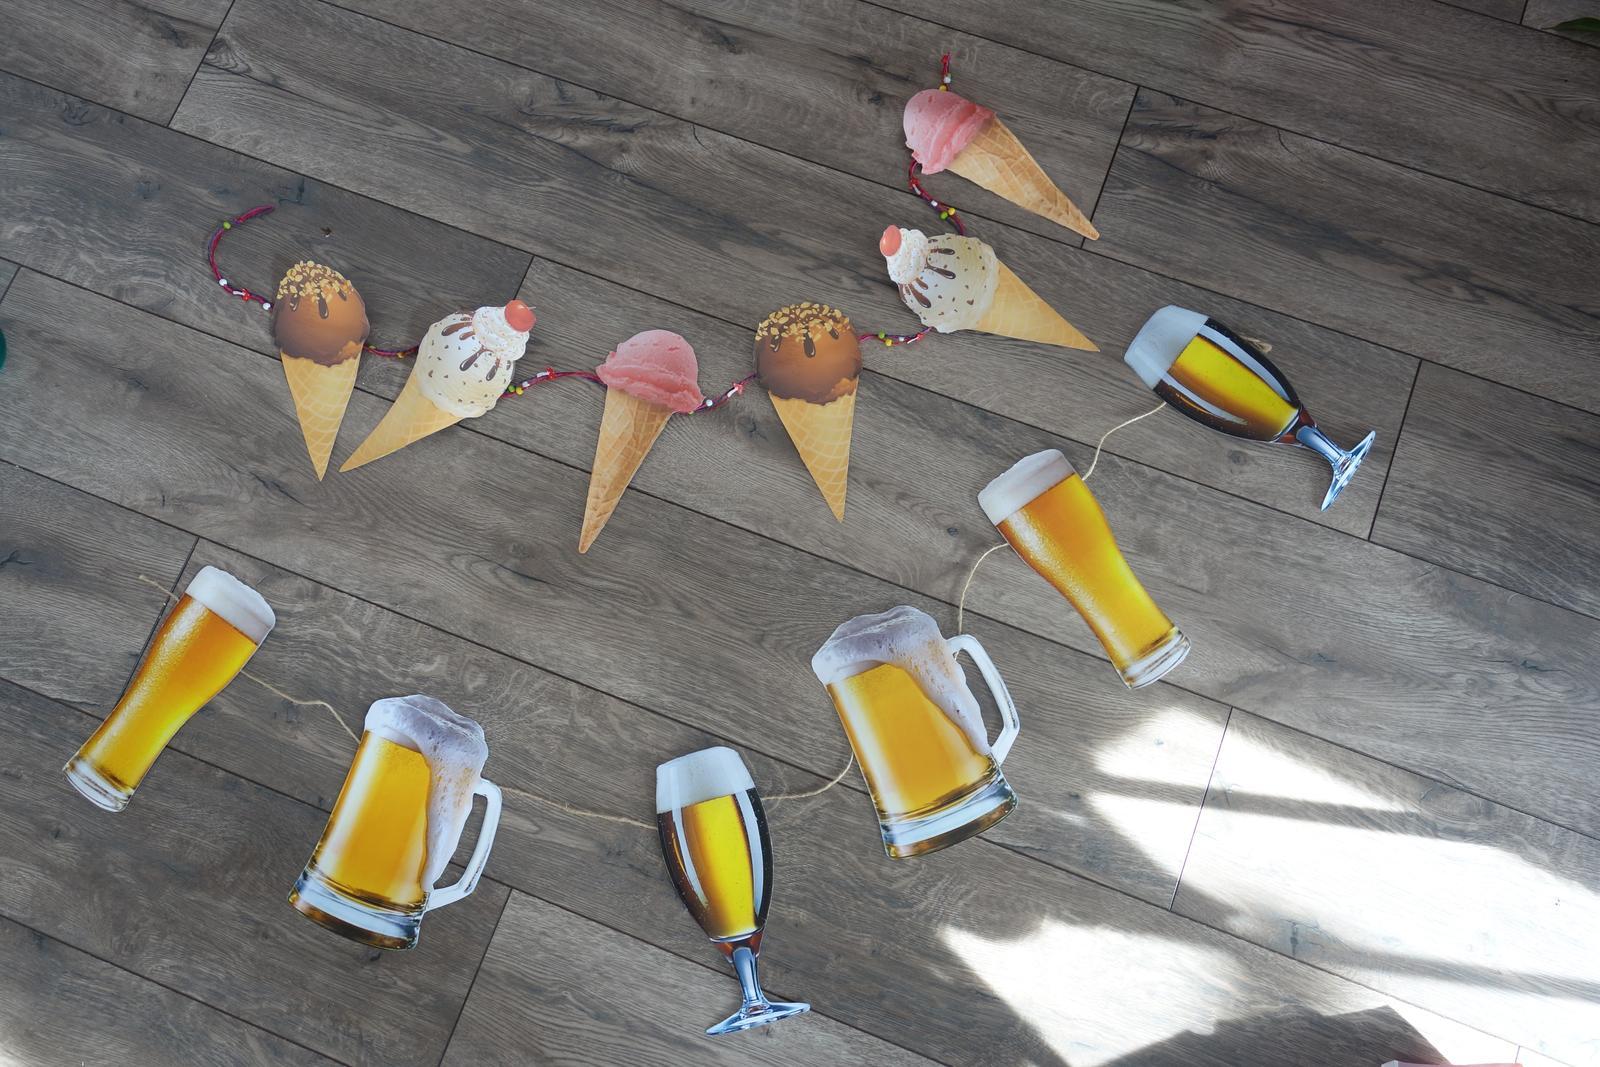 Girlandy zmrzlina a pivo - Obrázok č. 1